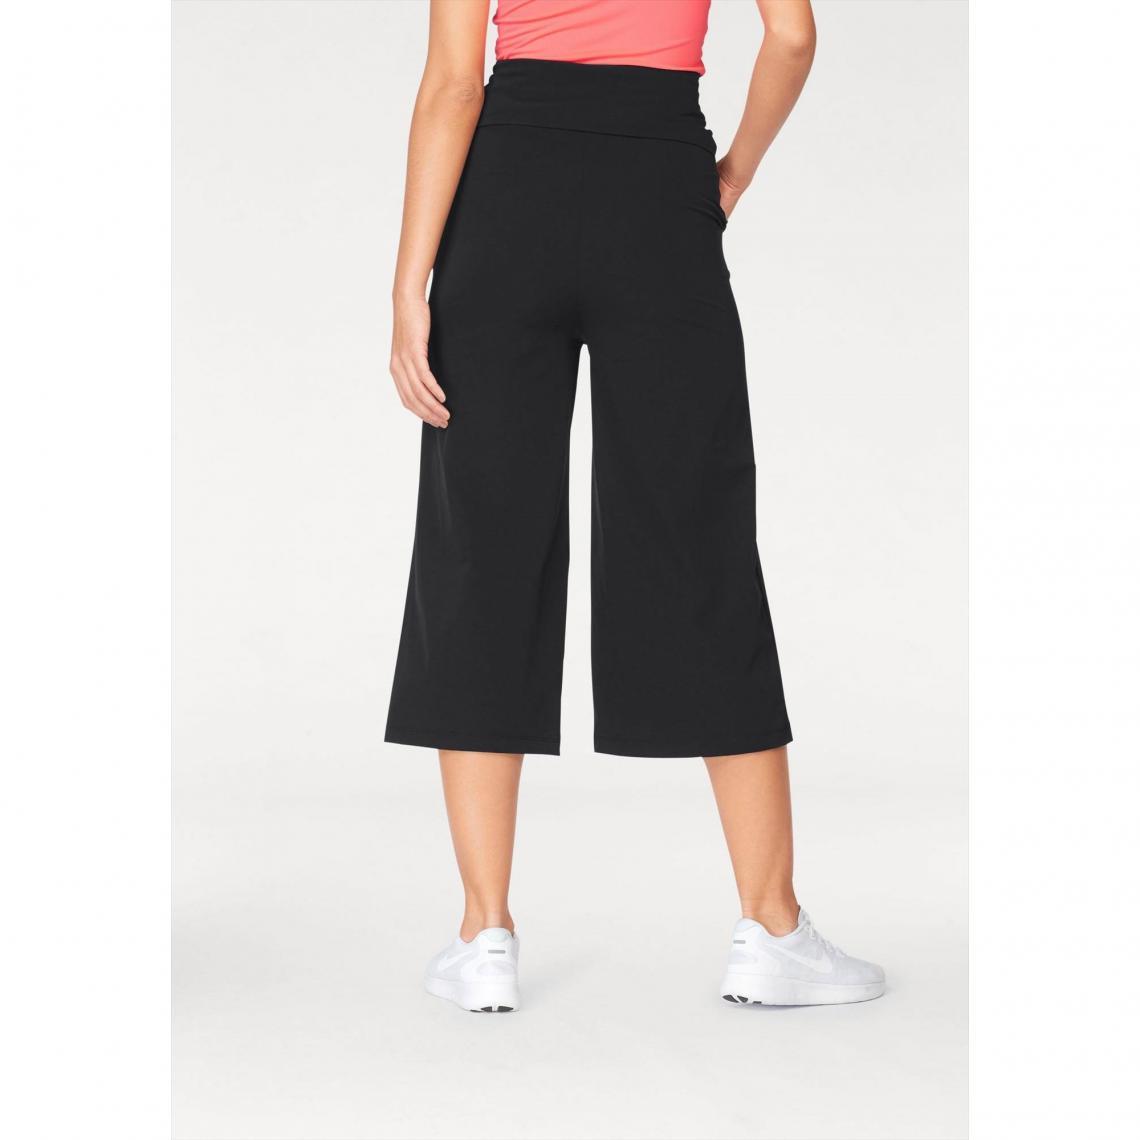 pantalon nike noir femme